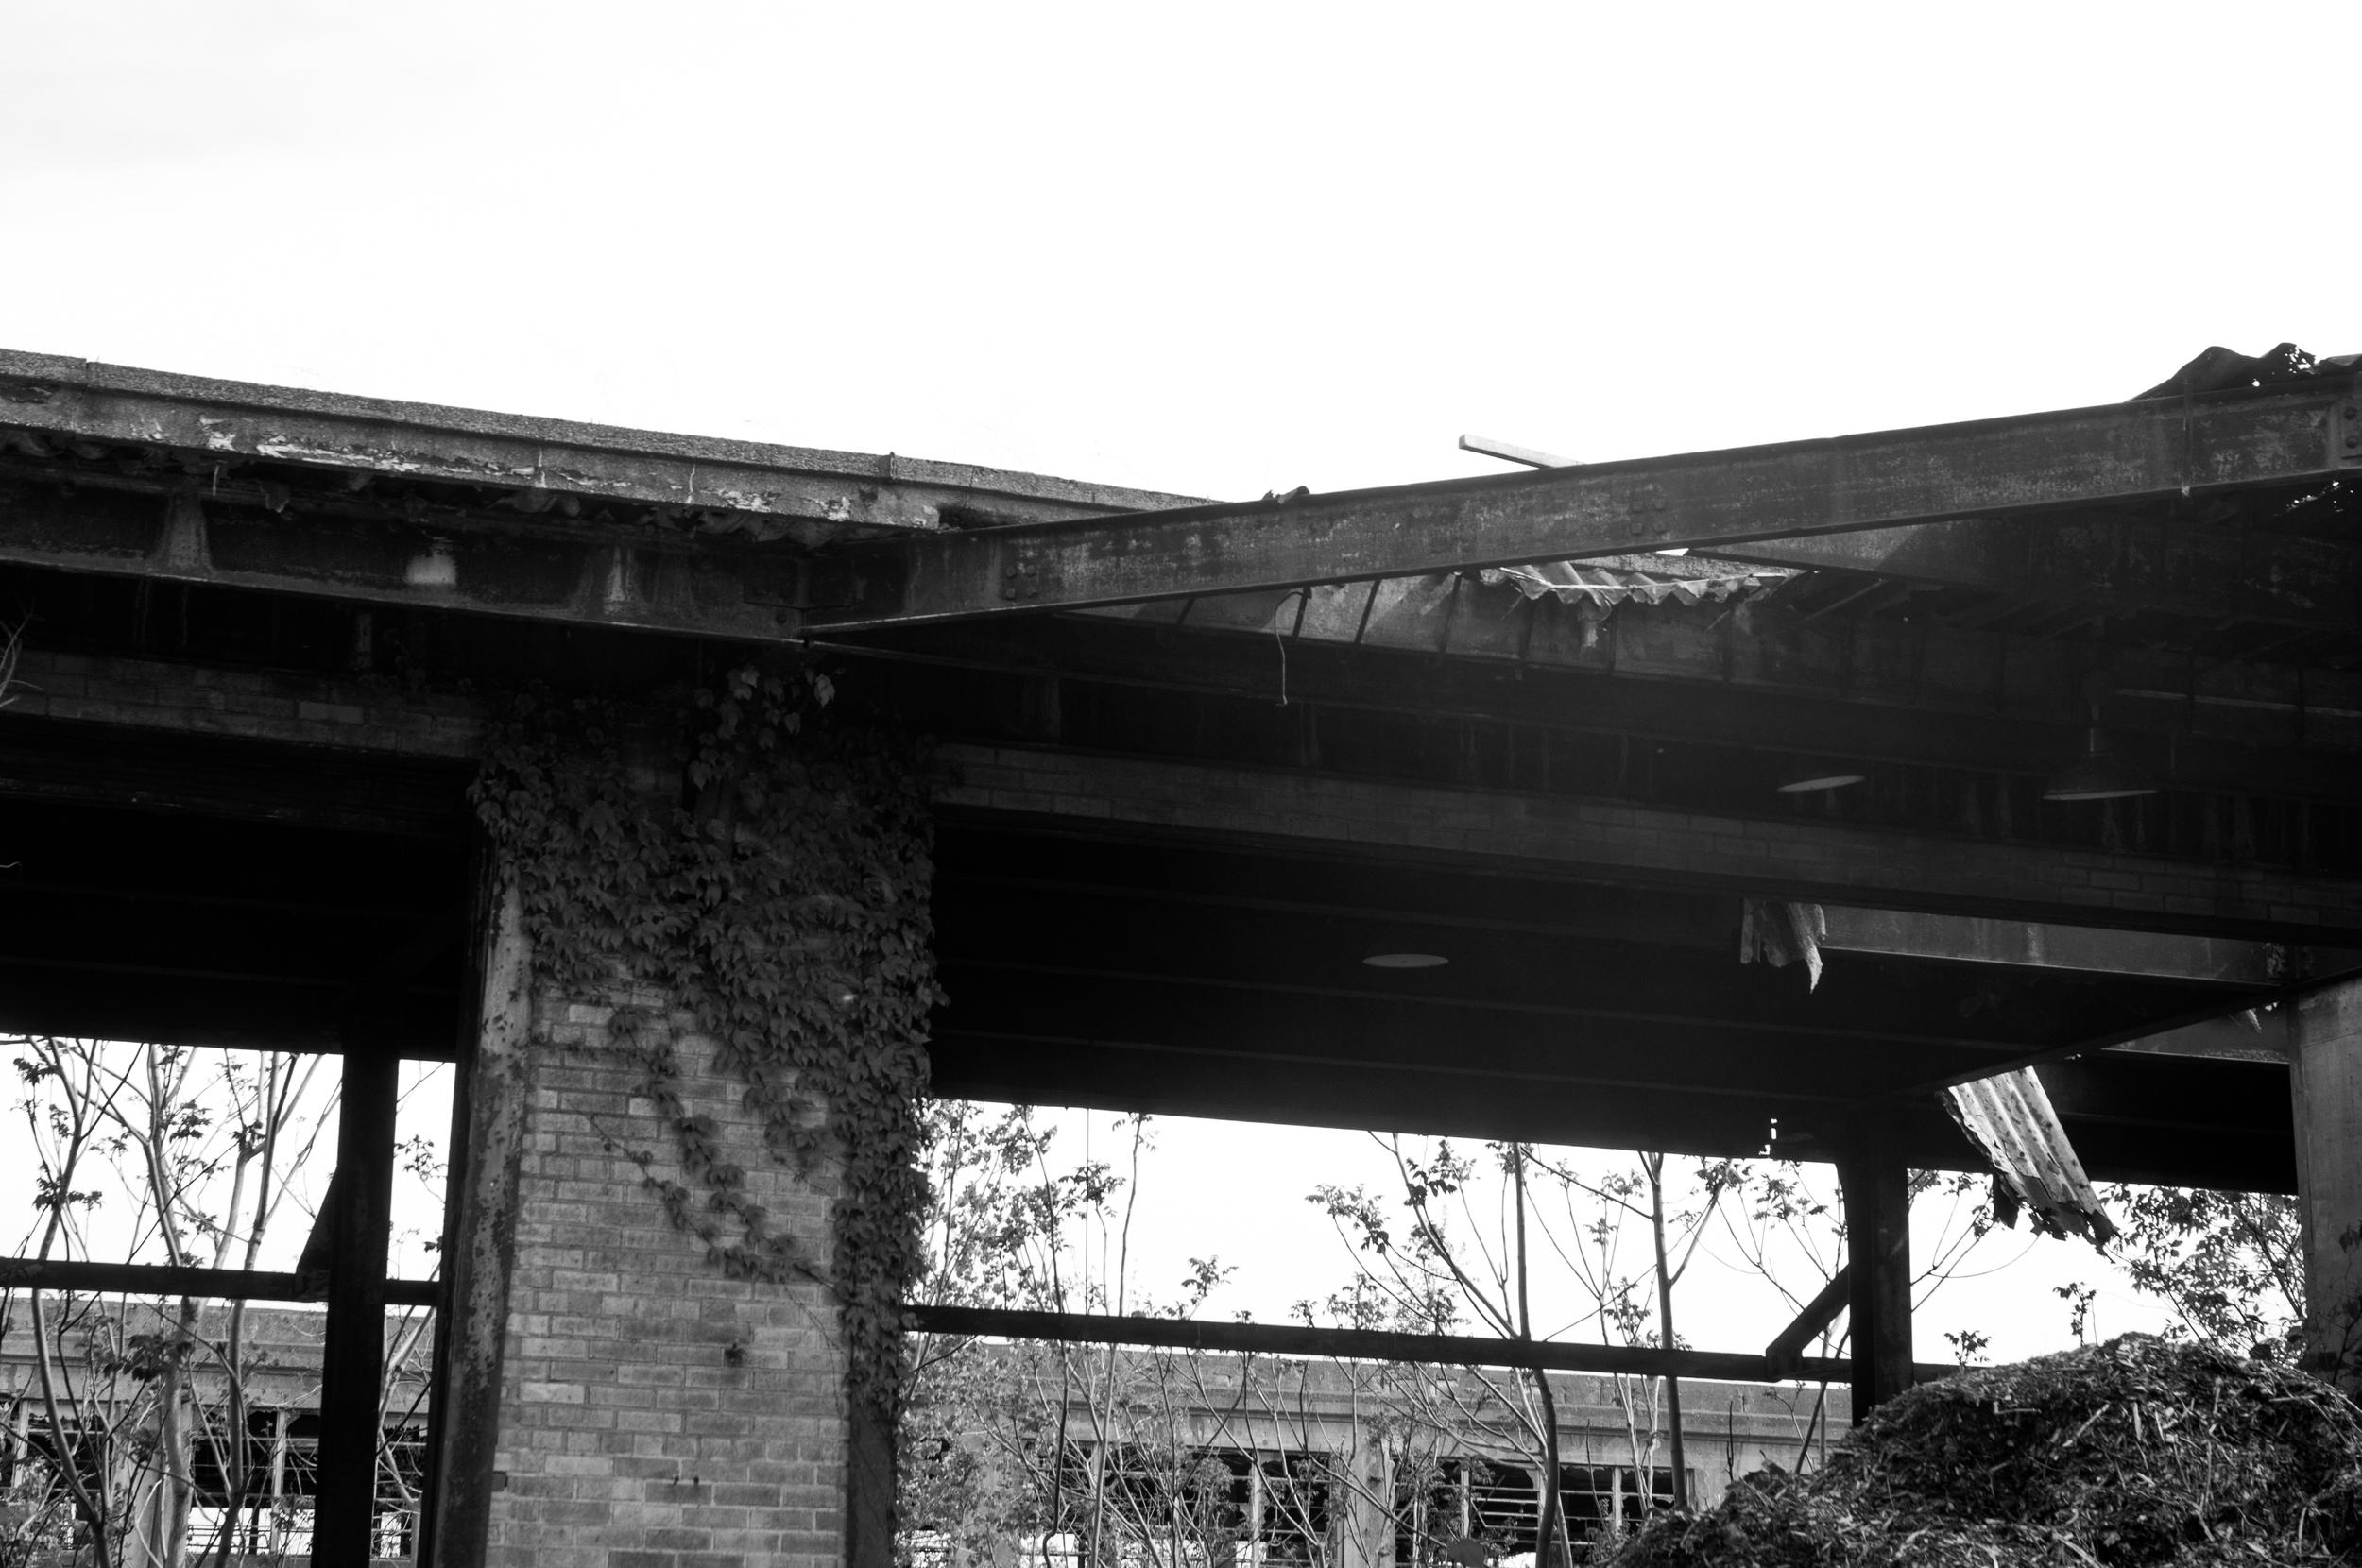 Buffalo_Decay-3031.jpg